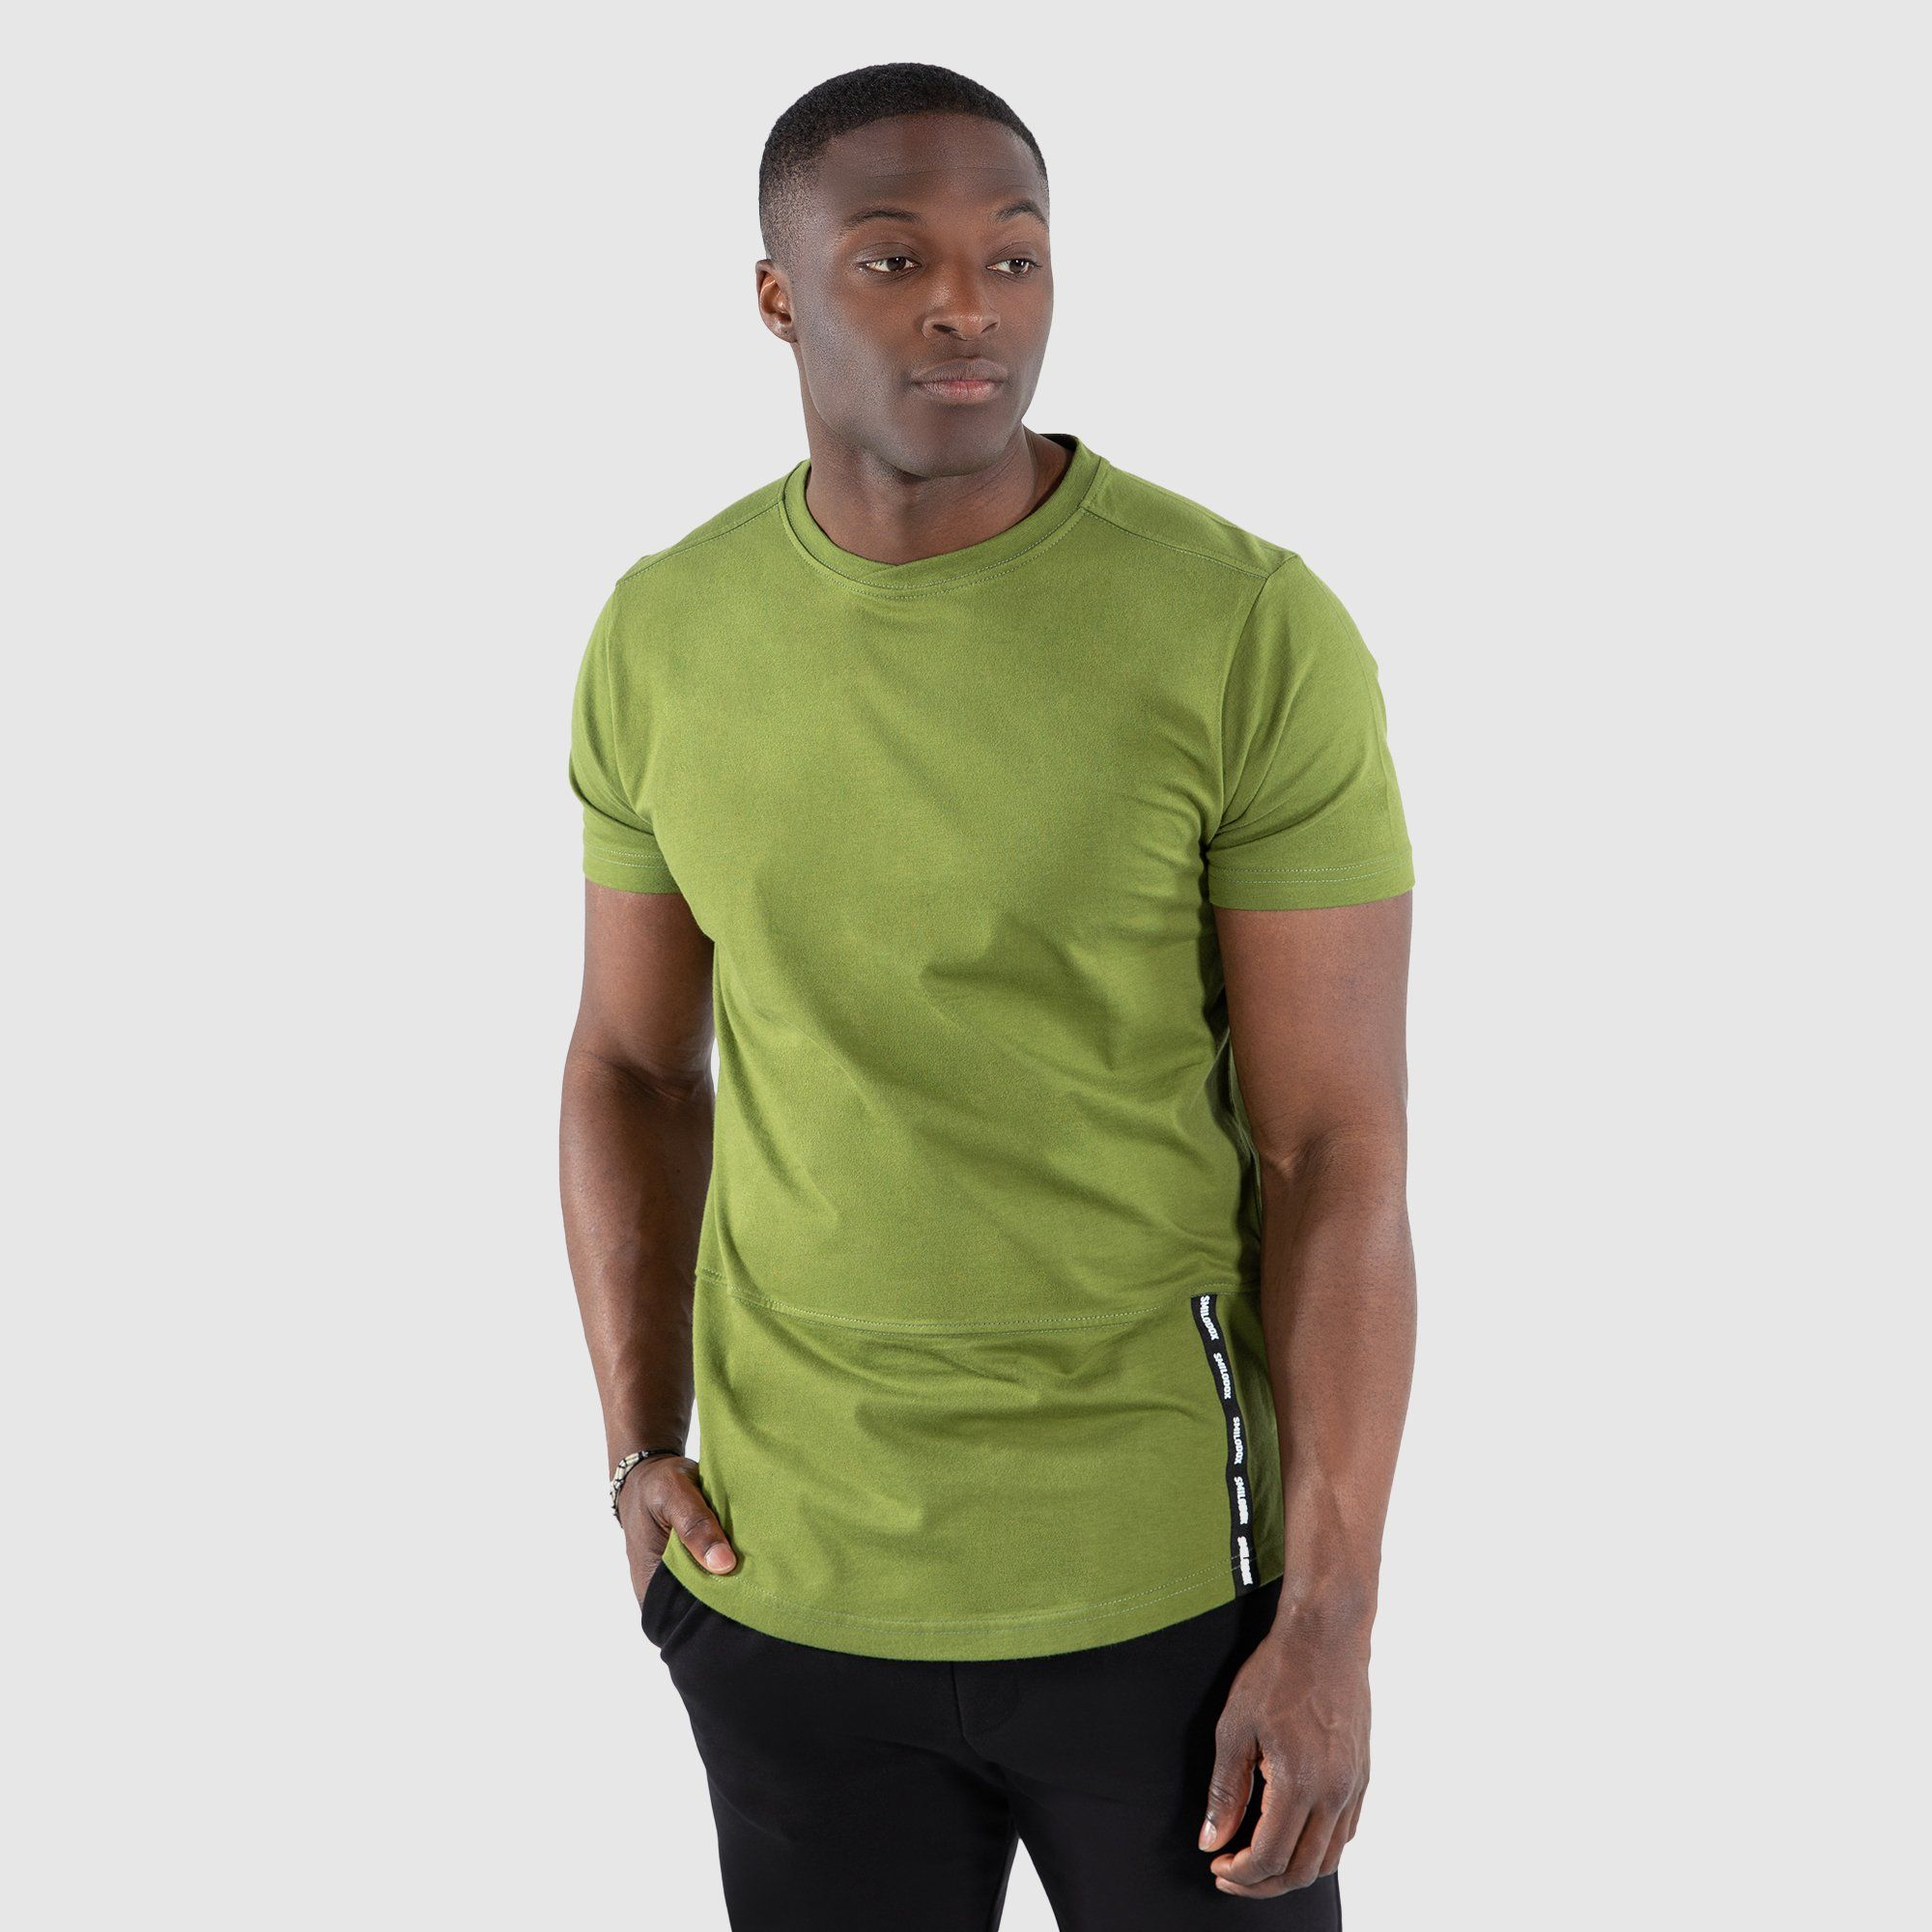 T-Shirt Hayo - Khaki / XL